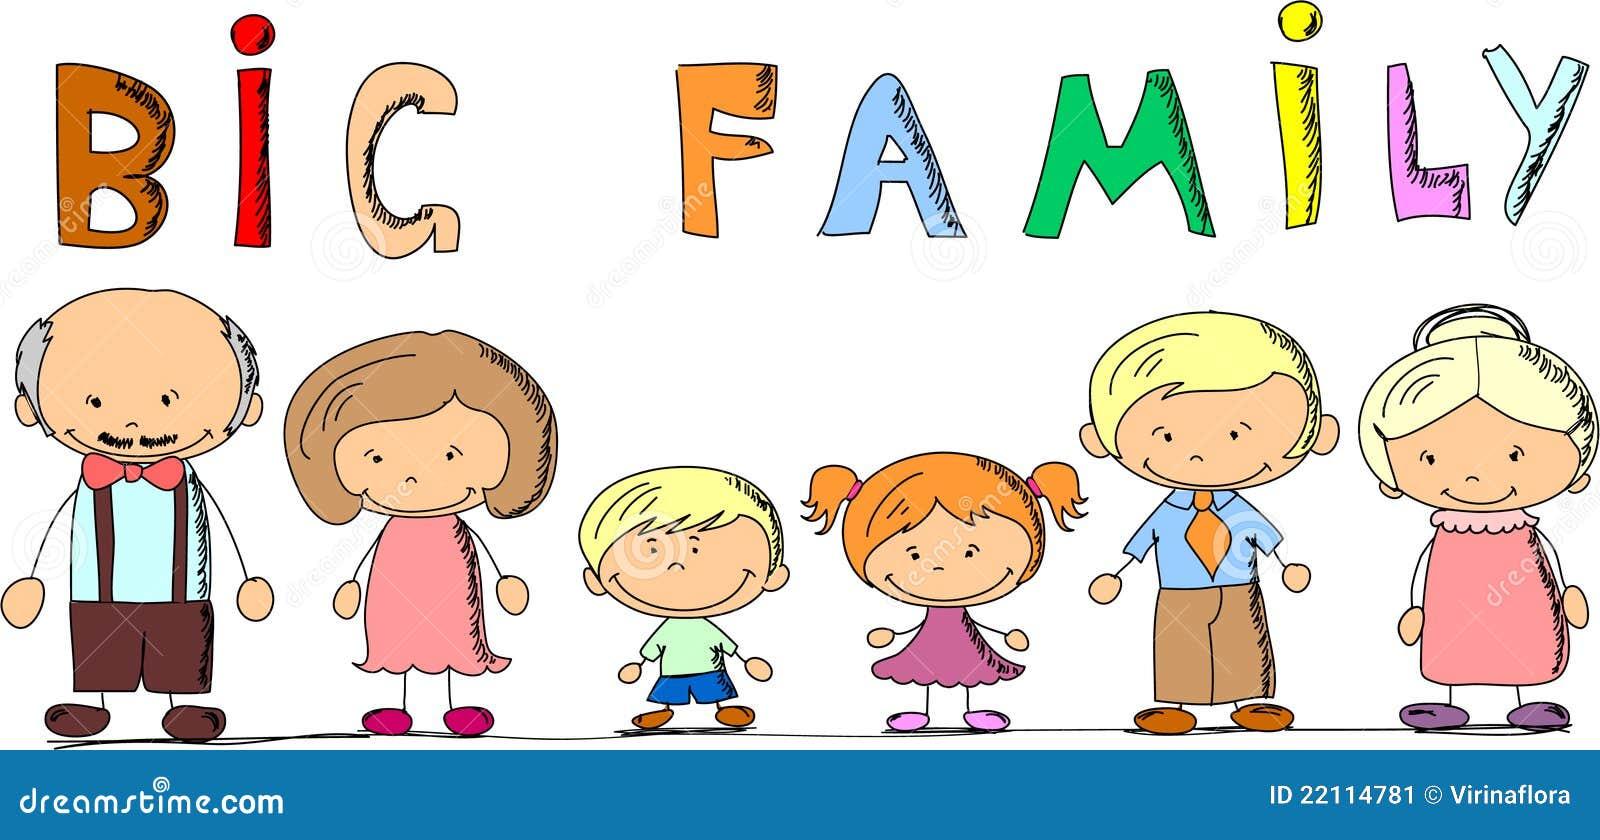 cartoon happy family vector stock image image 22114781 family reunion clip art images free family reunion clip art images google